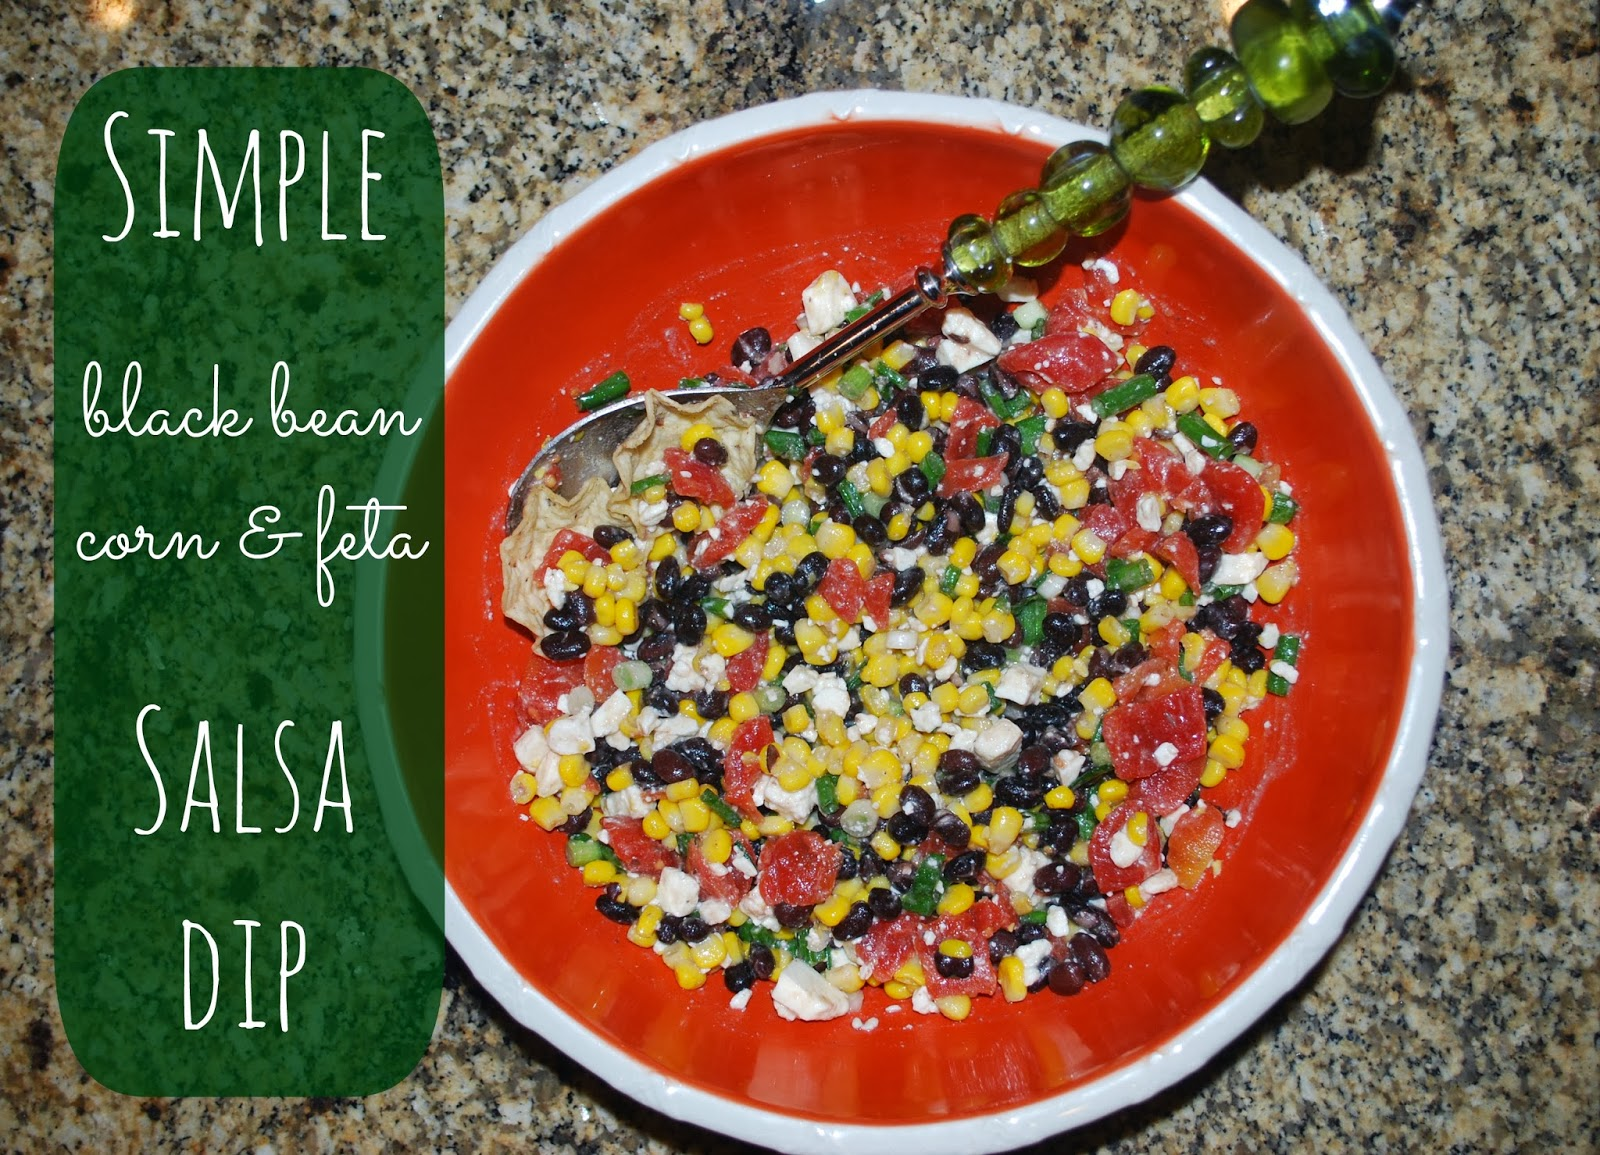 Black Bean, Corn, & Feta Salsa Dip | Recipe - Simply Elliott